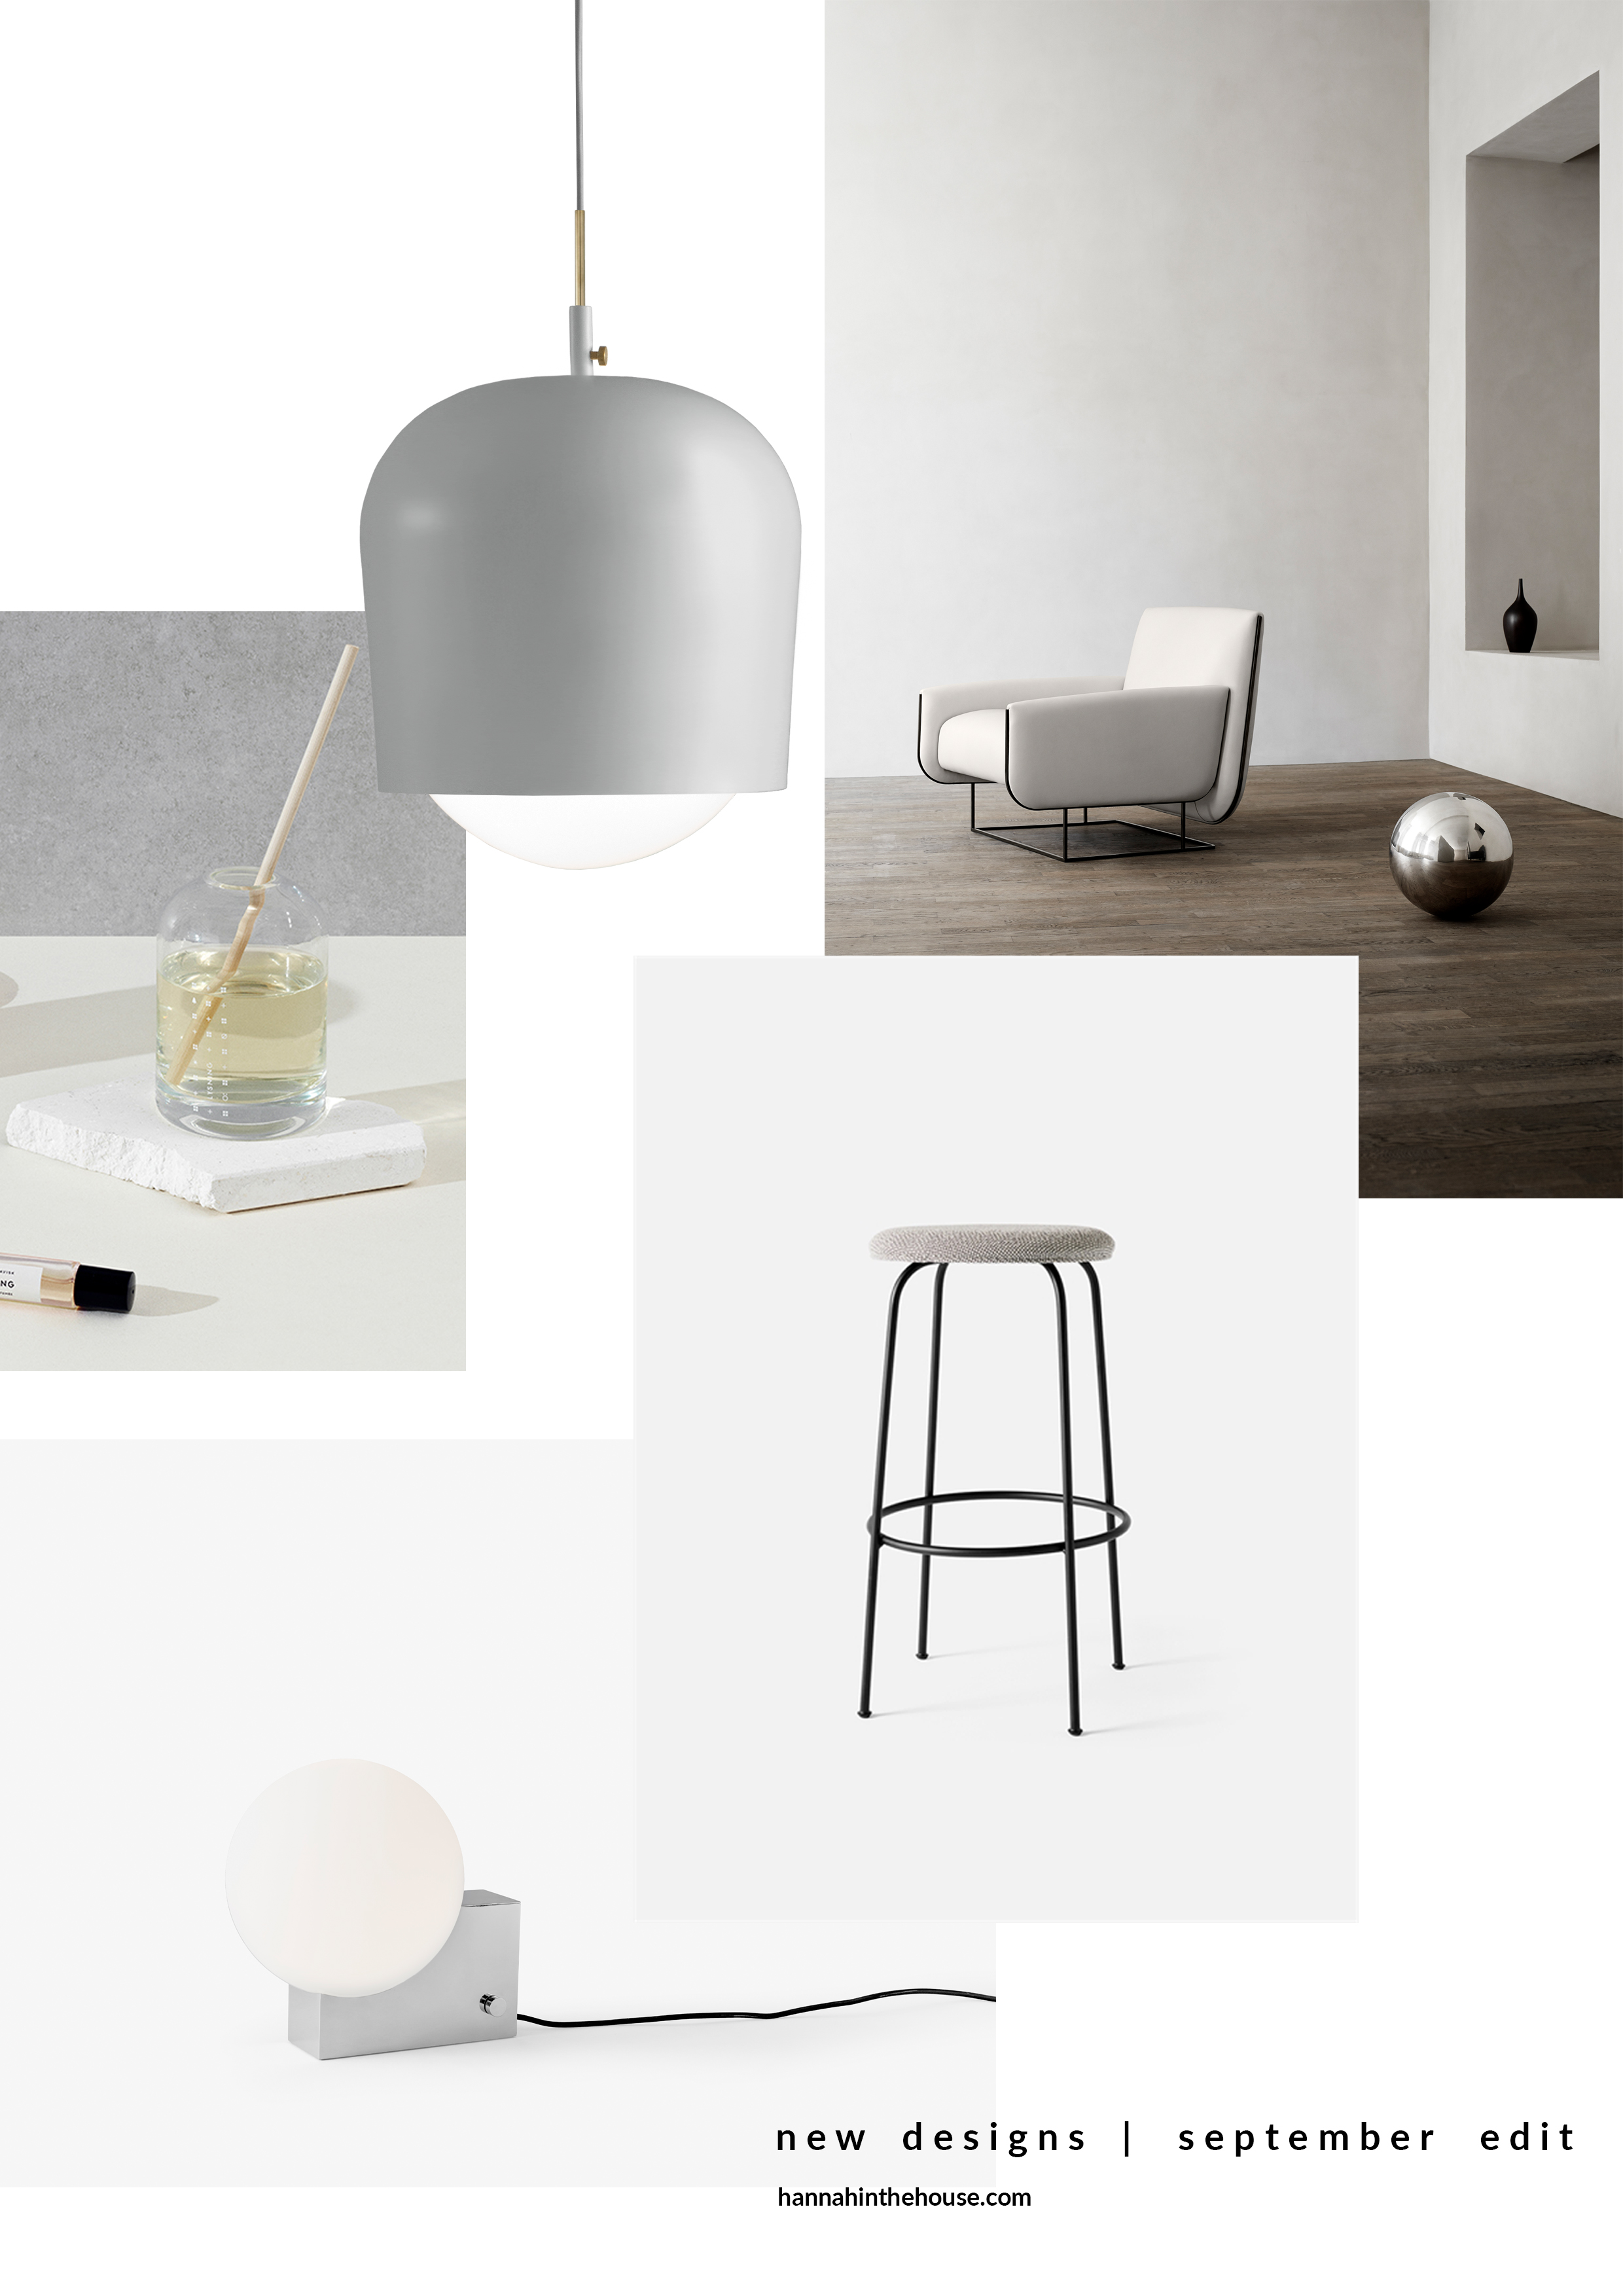 new designs | september edit